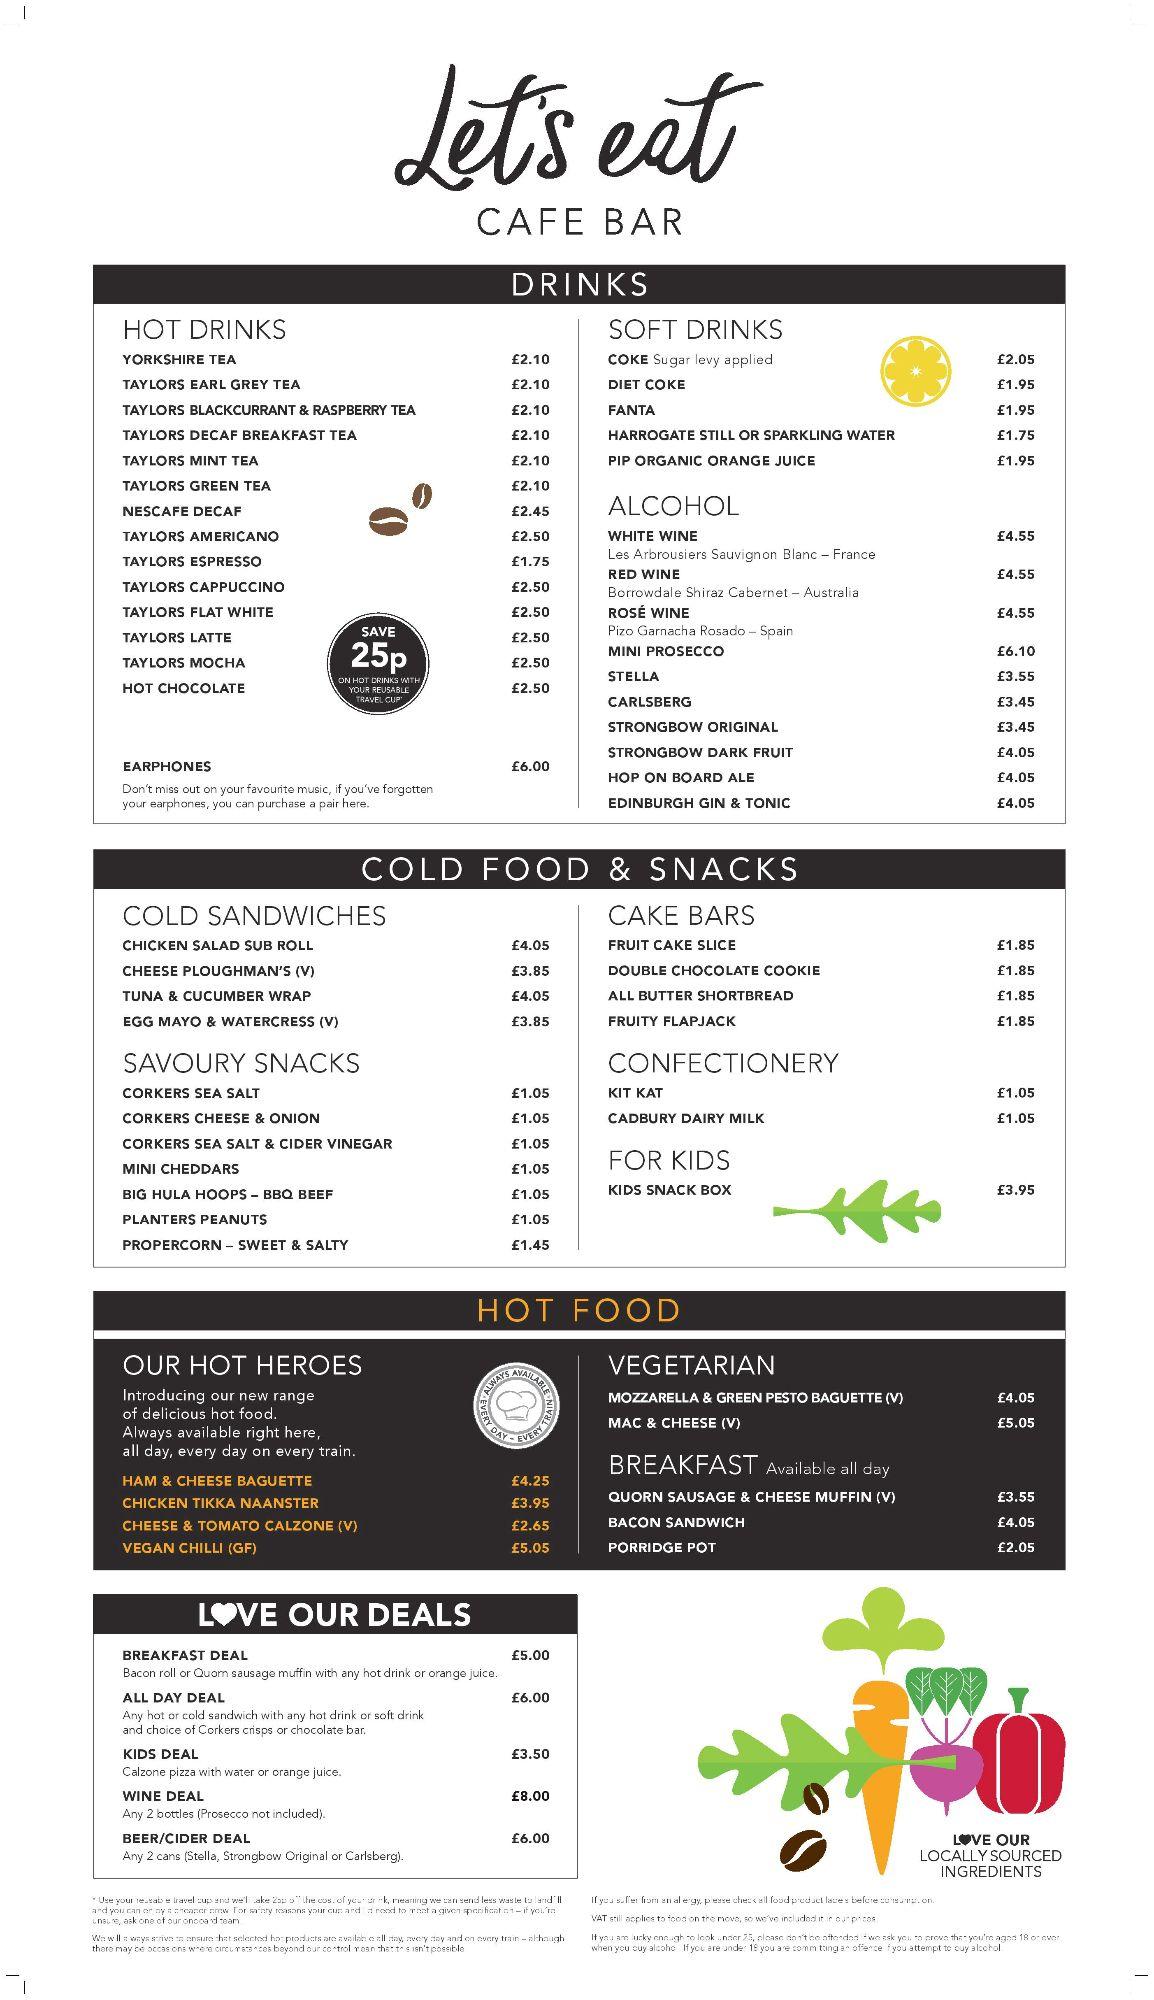 Image showing a sample of the LNER Cafe Bar menu circa 2019.